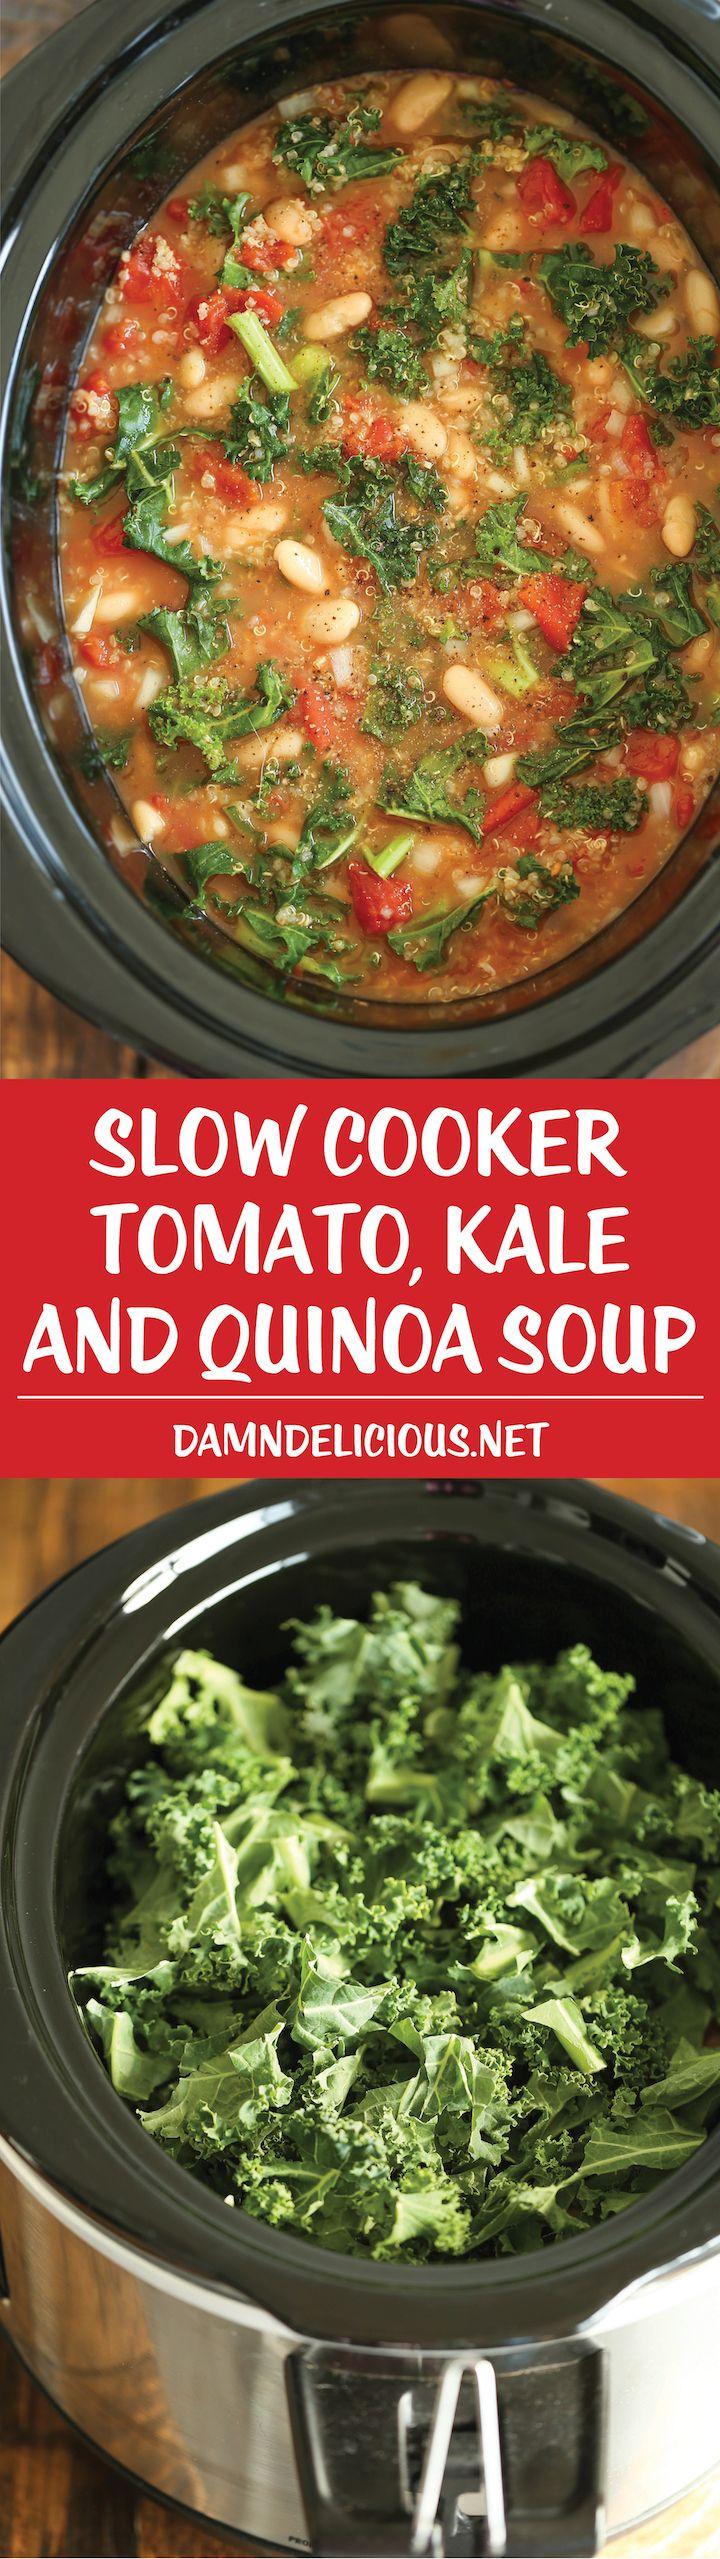 Slow Cooker Tomato, Kale And Quinoa Soup